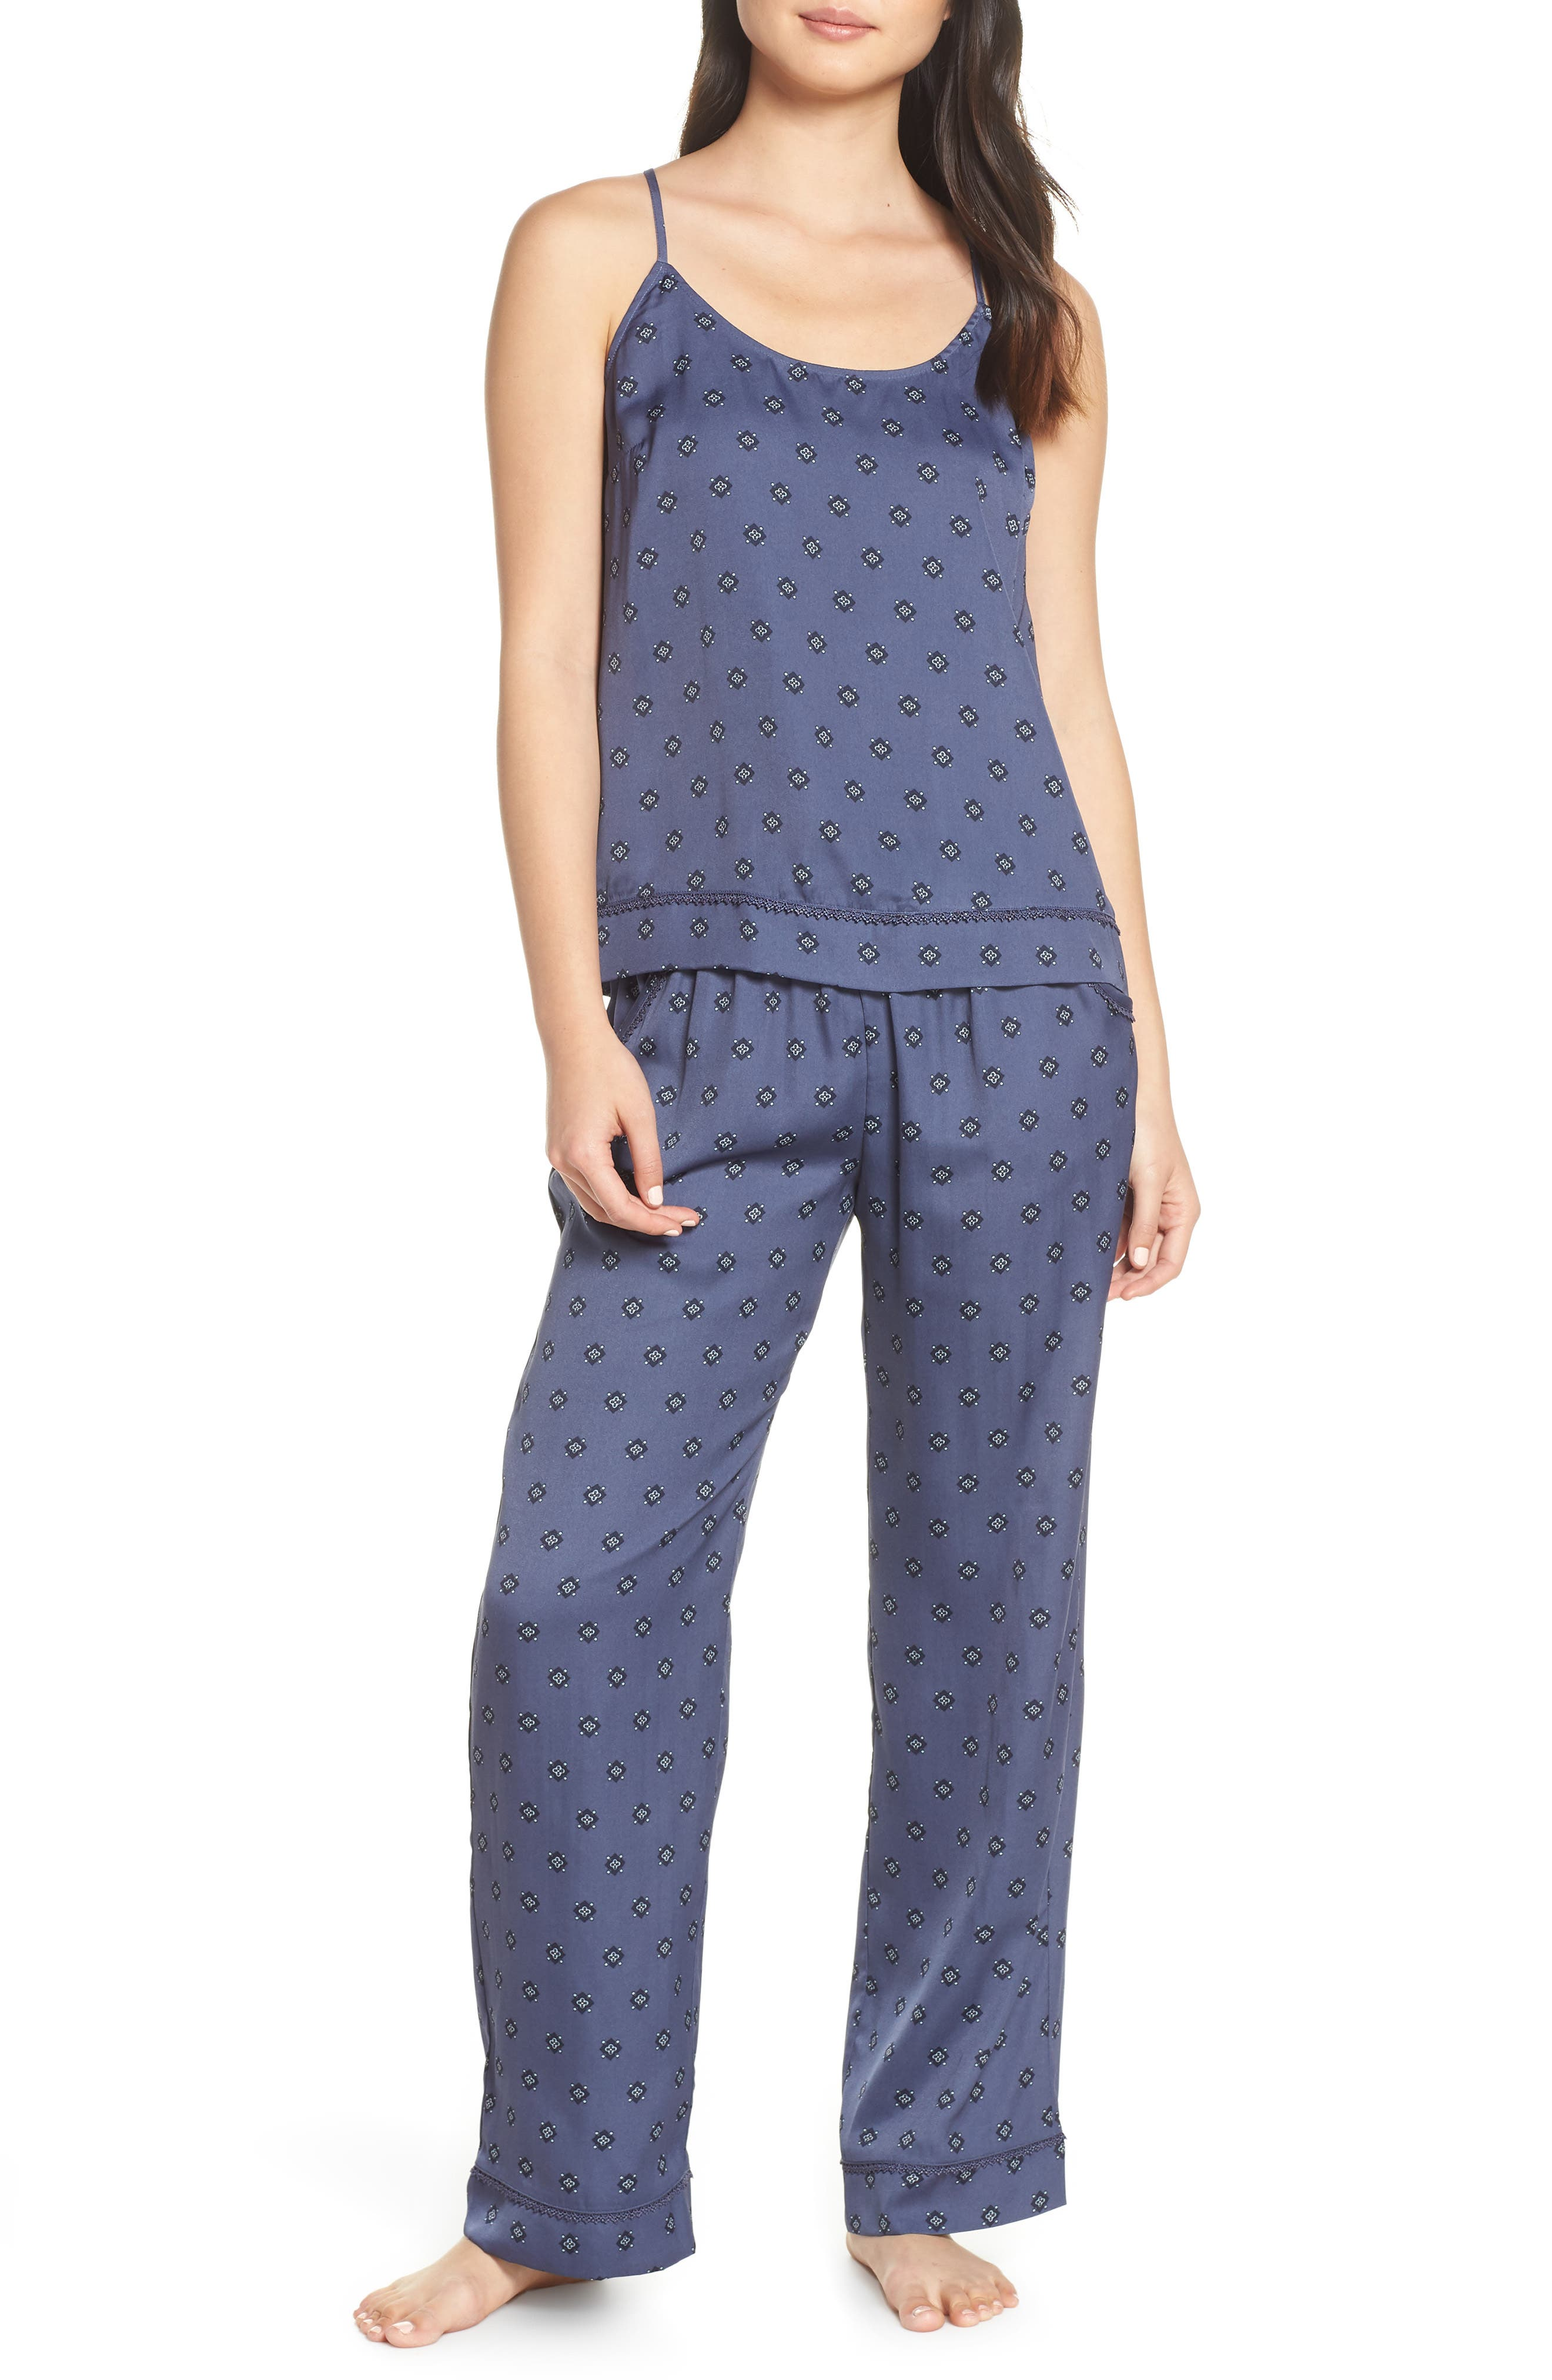 Nordstrom Lingerie Sweet Dreams Satin Pajamas, Blue